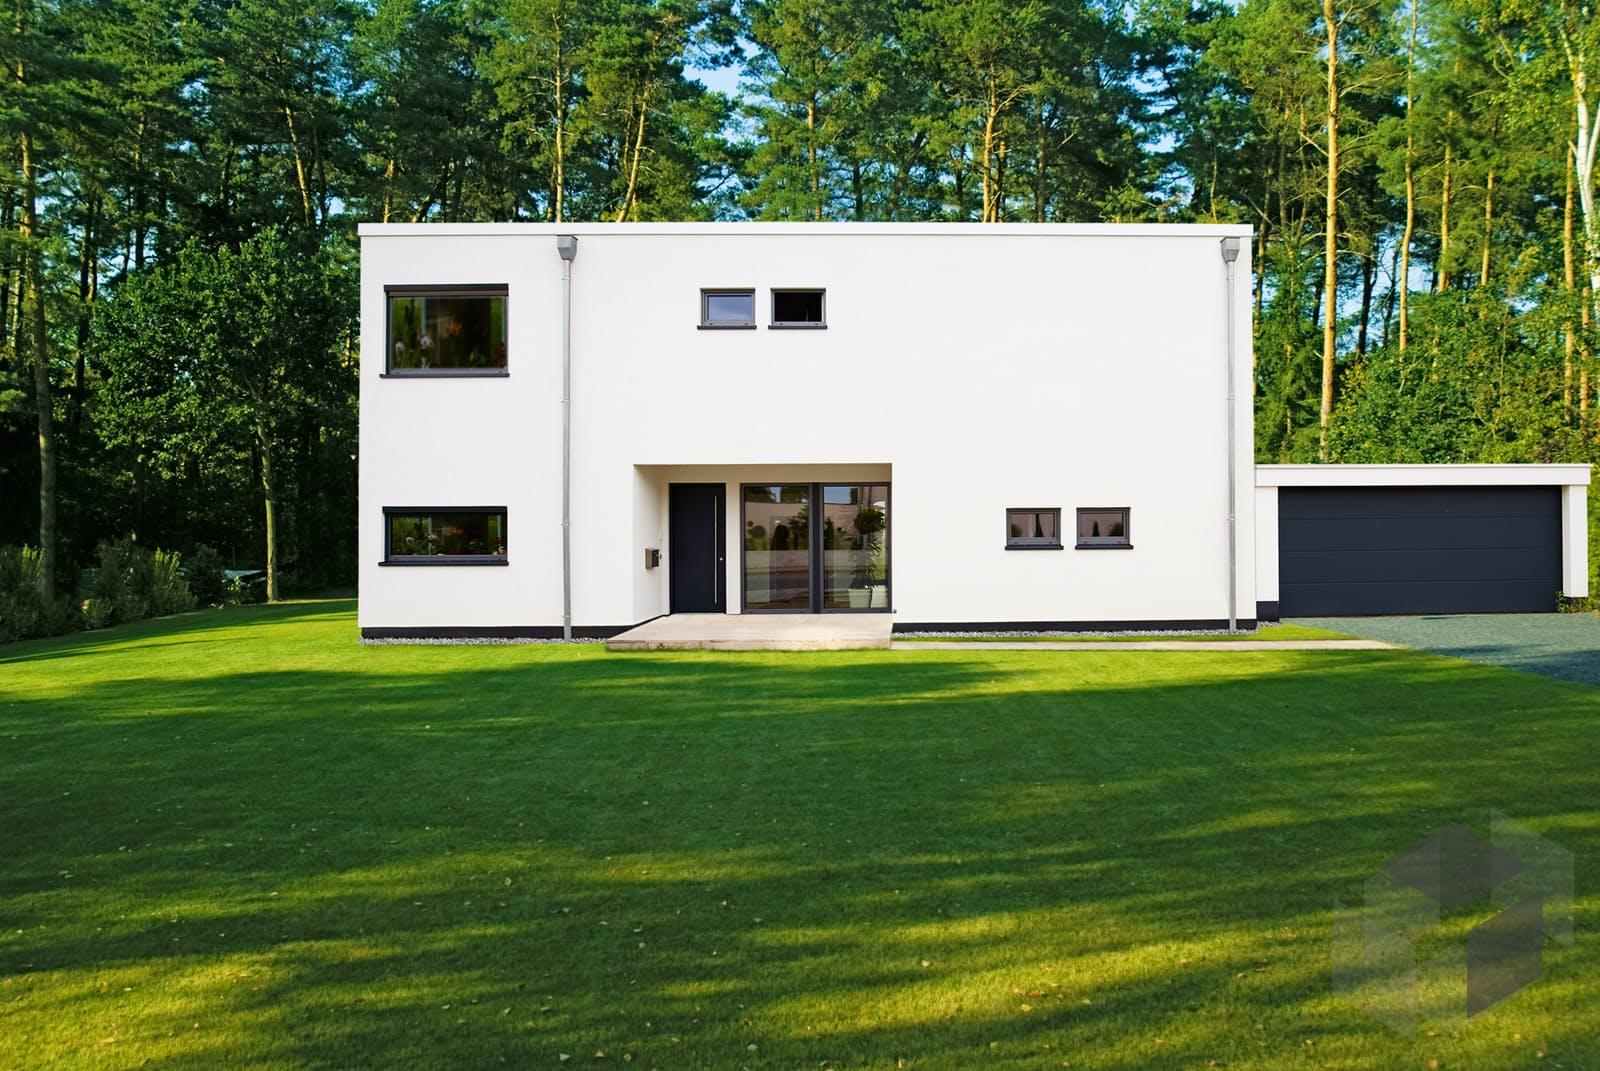 bauhausvilla cubus inactive von haacke haus komplette daten bersicht. Black Bedroom Furniture Sets. Home Design Ideas